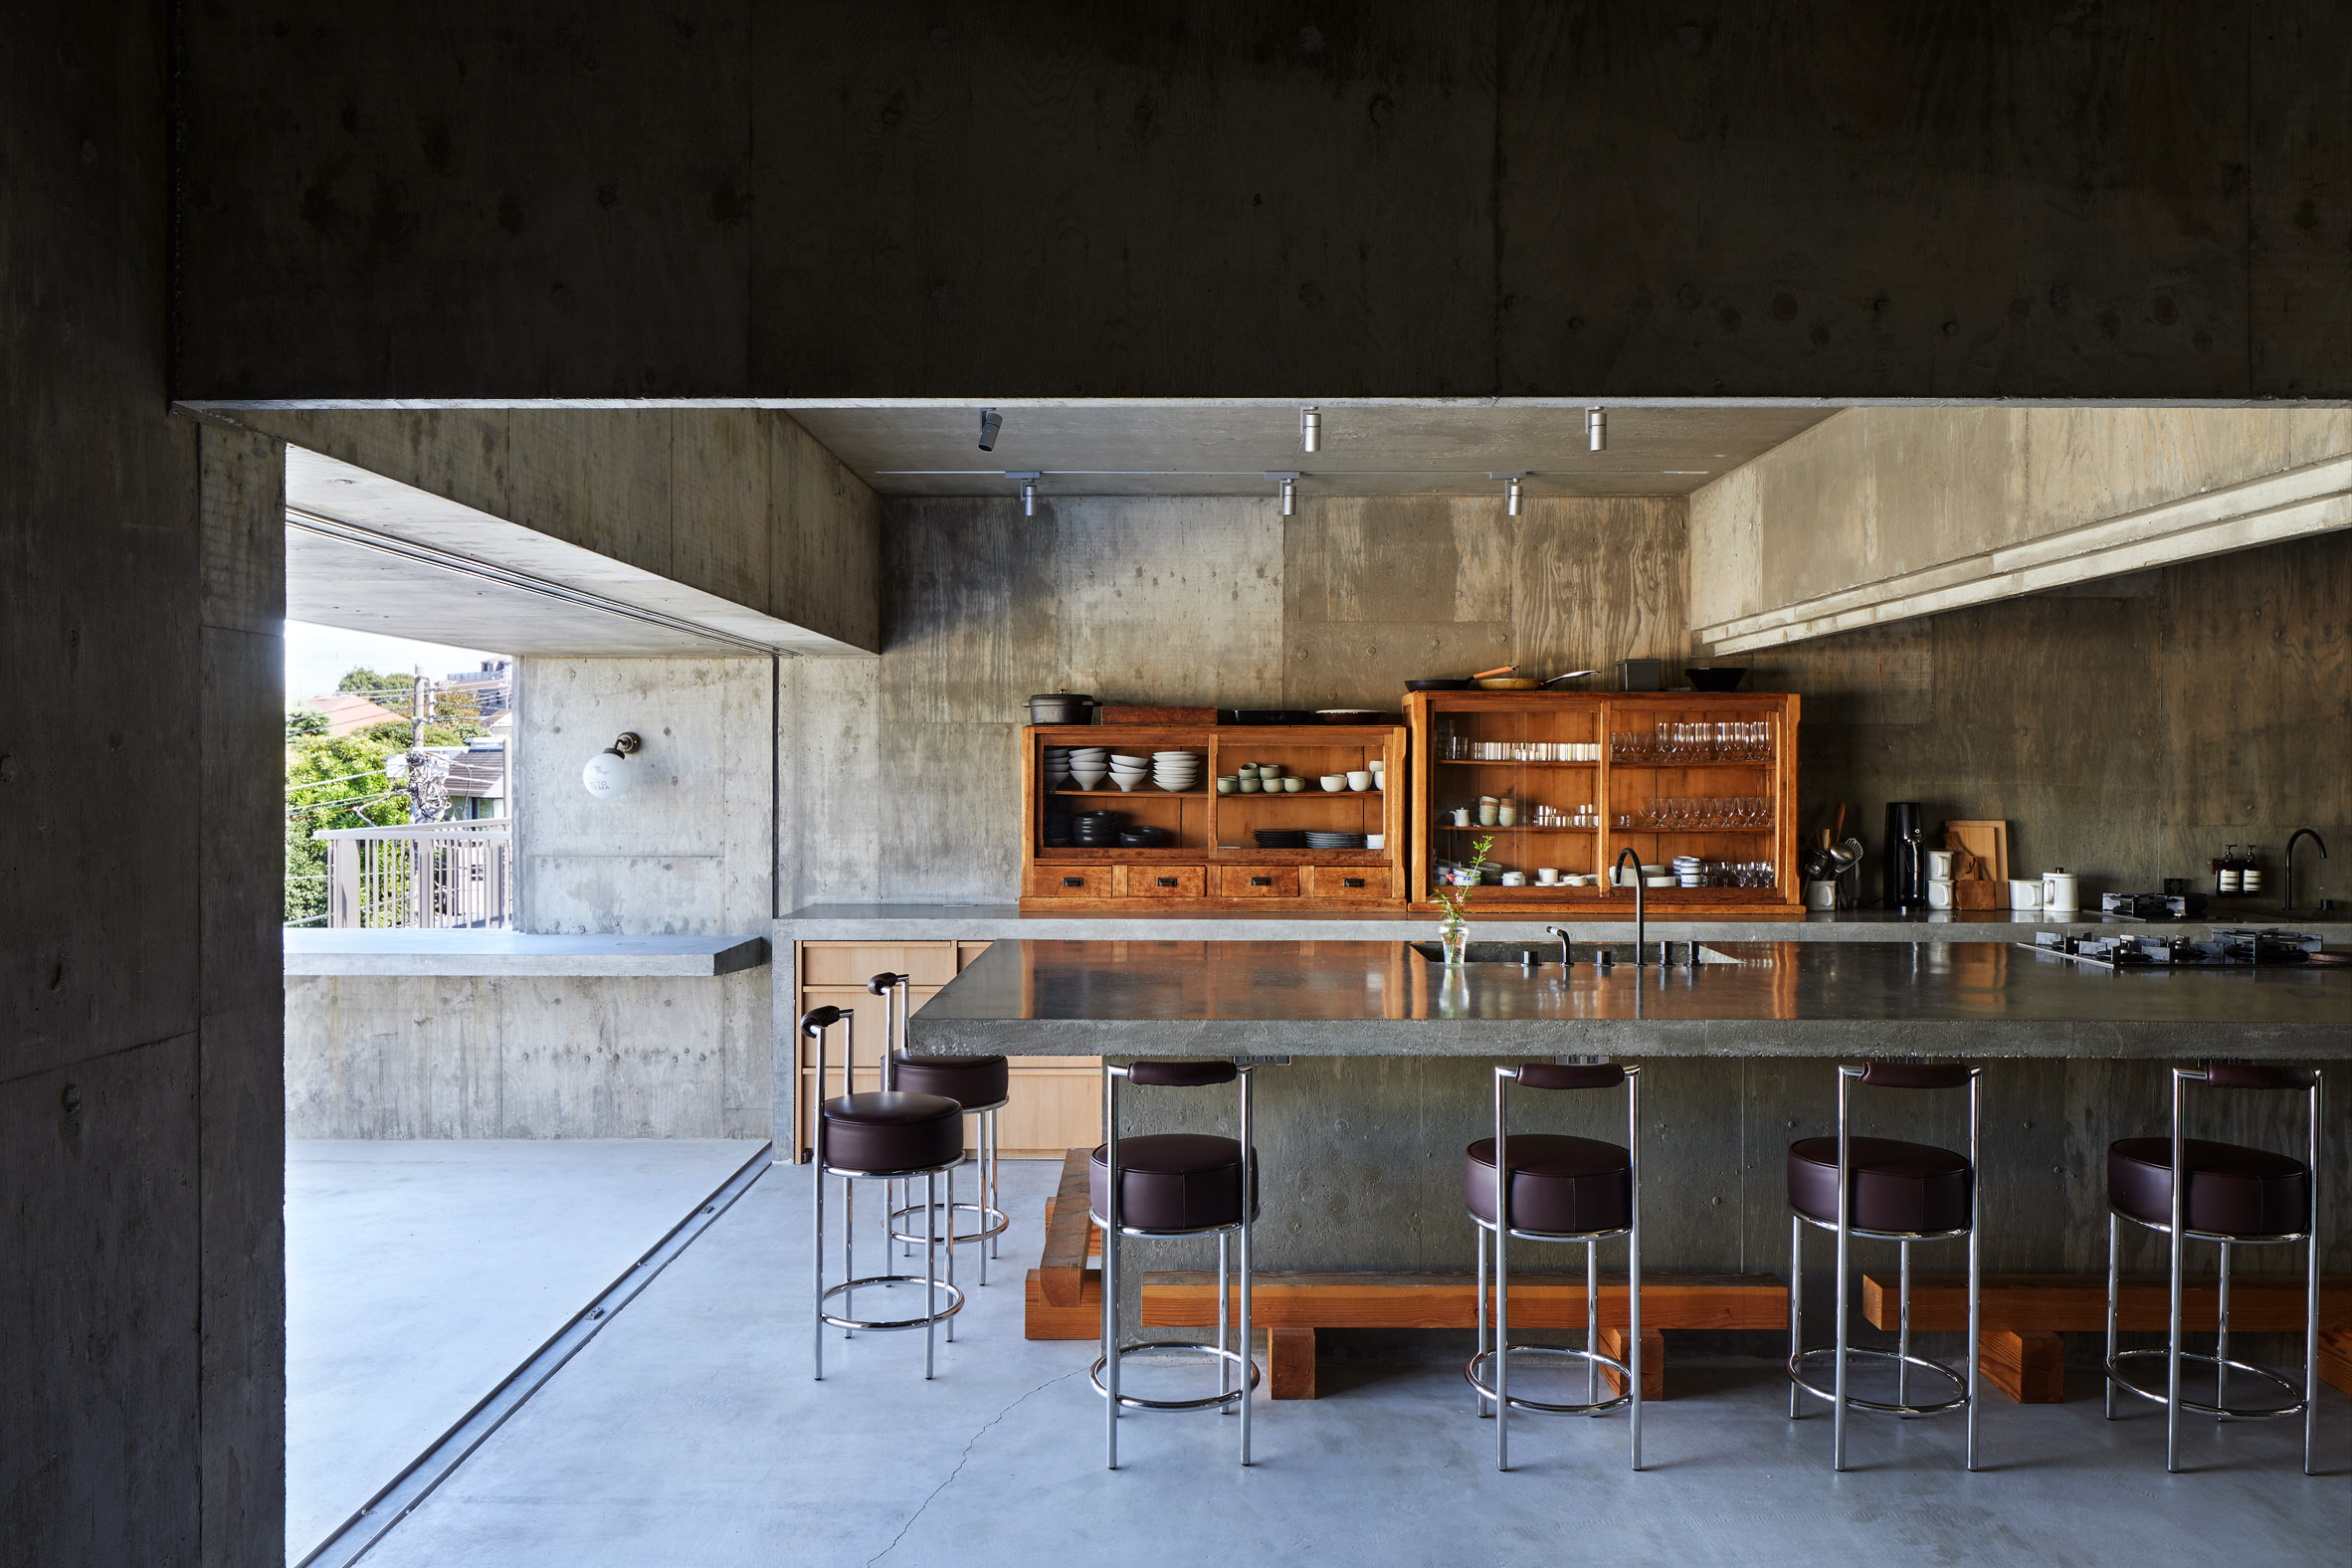 A concrete restaurant interior in Japan